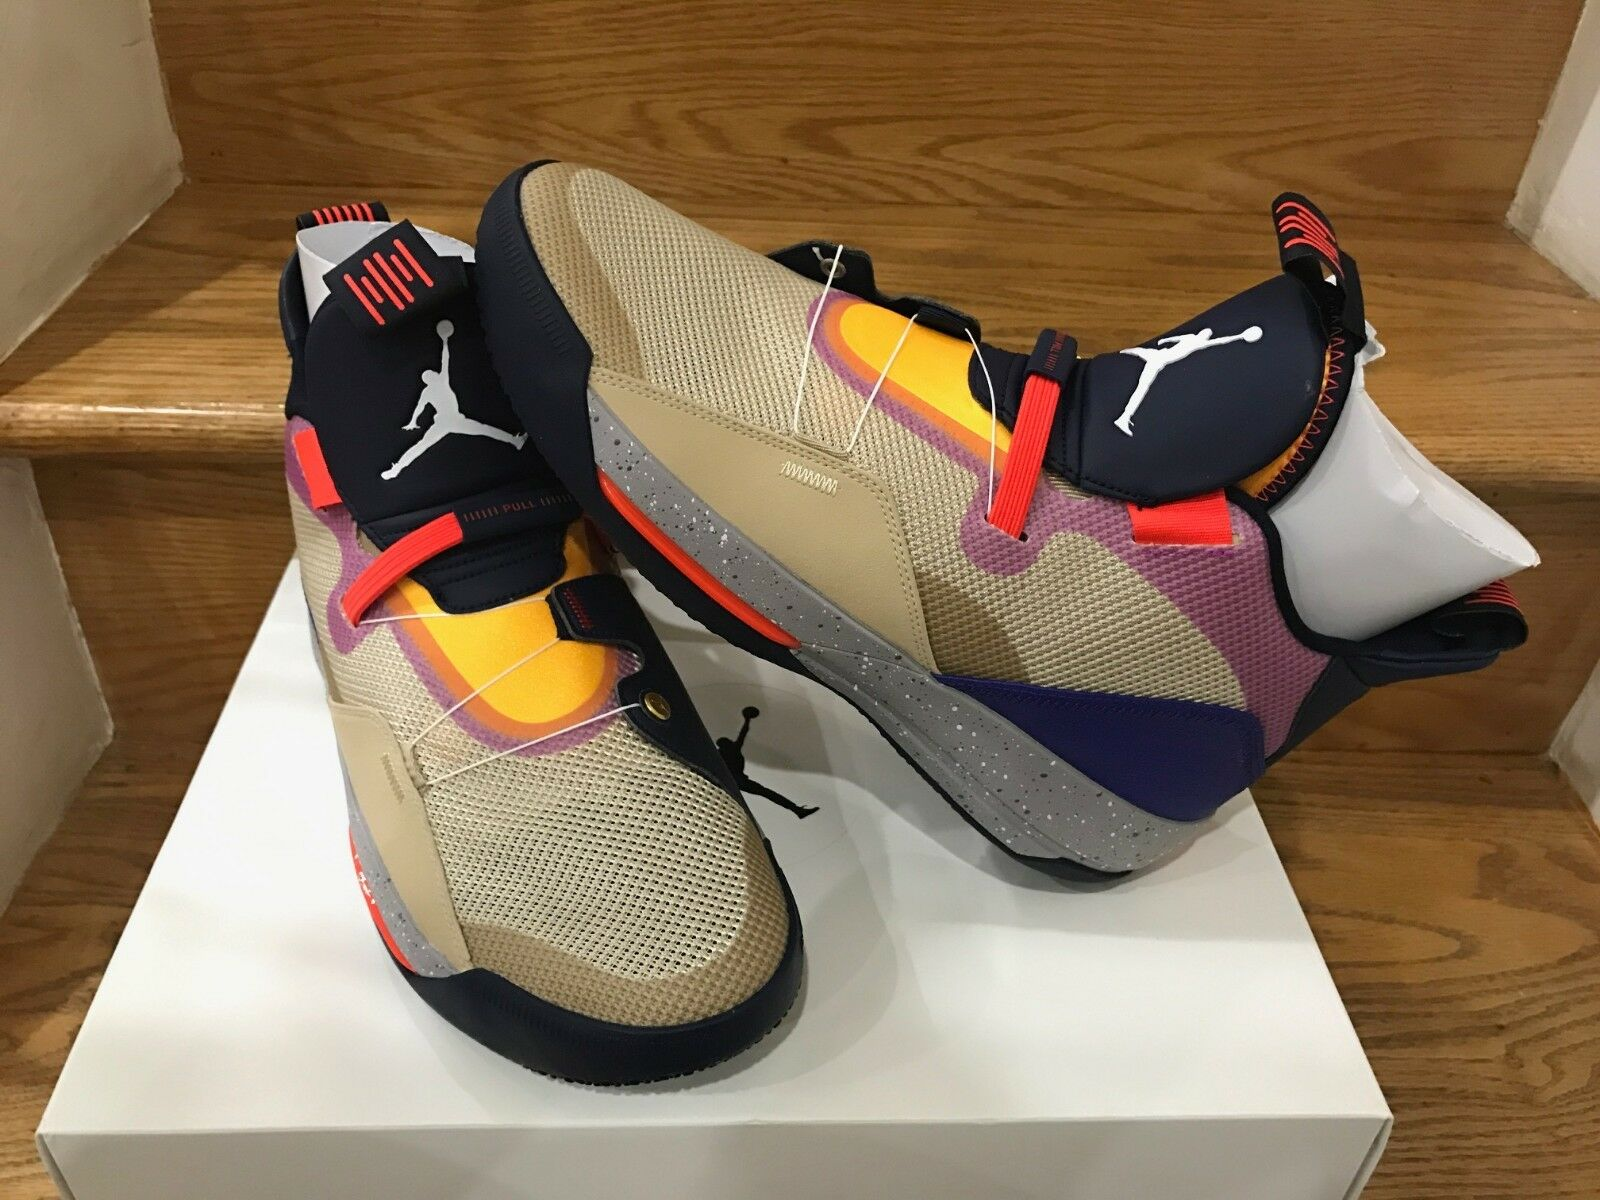 Nike air air Nike jordan westbrook perché non zer0.1 master nero rosa blu mila uomini 4y-13 sz fd88f5